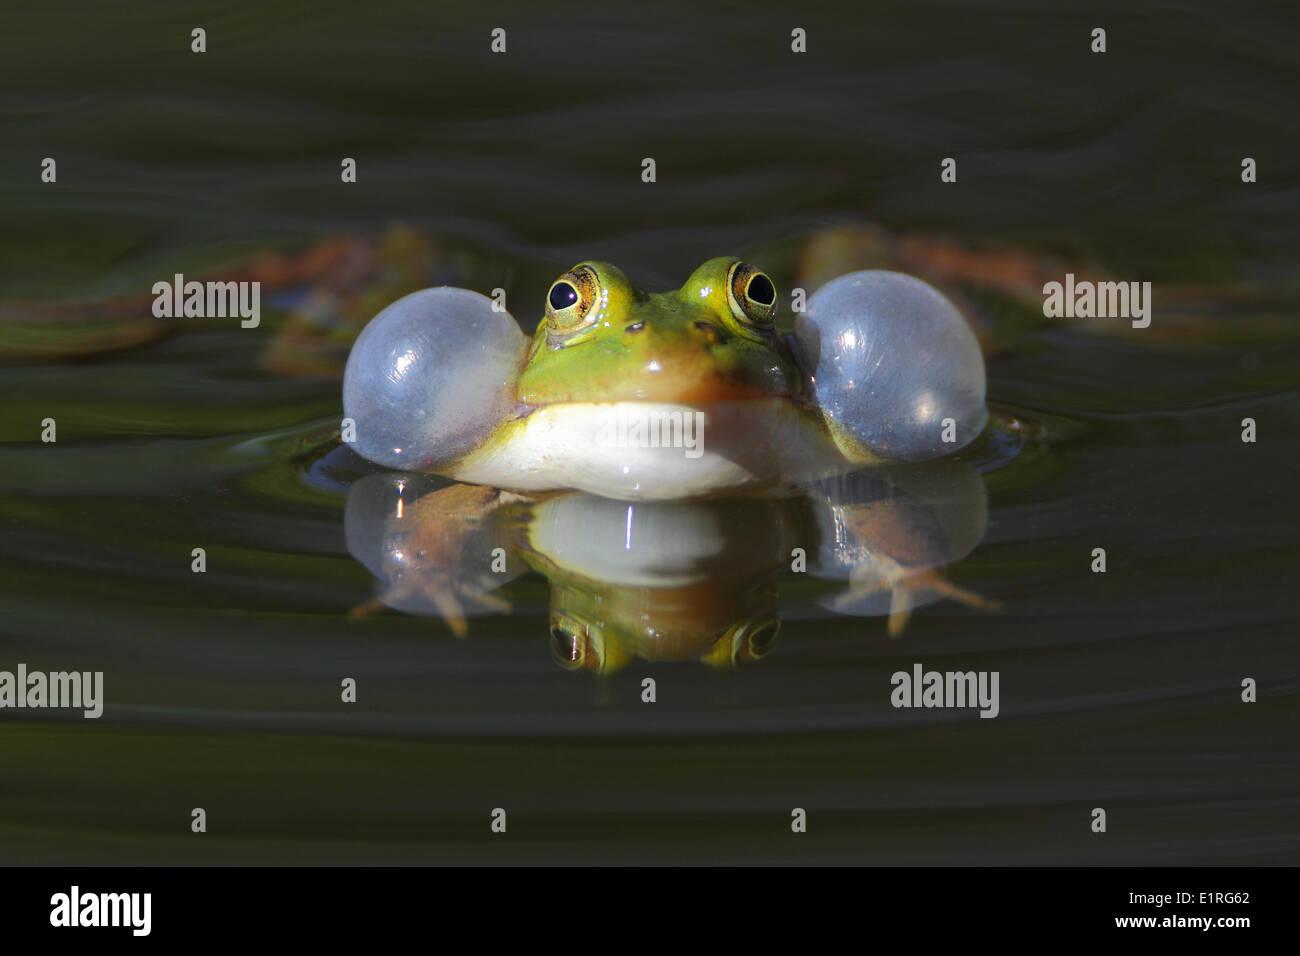 croaking male frog - Stock Image